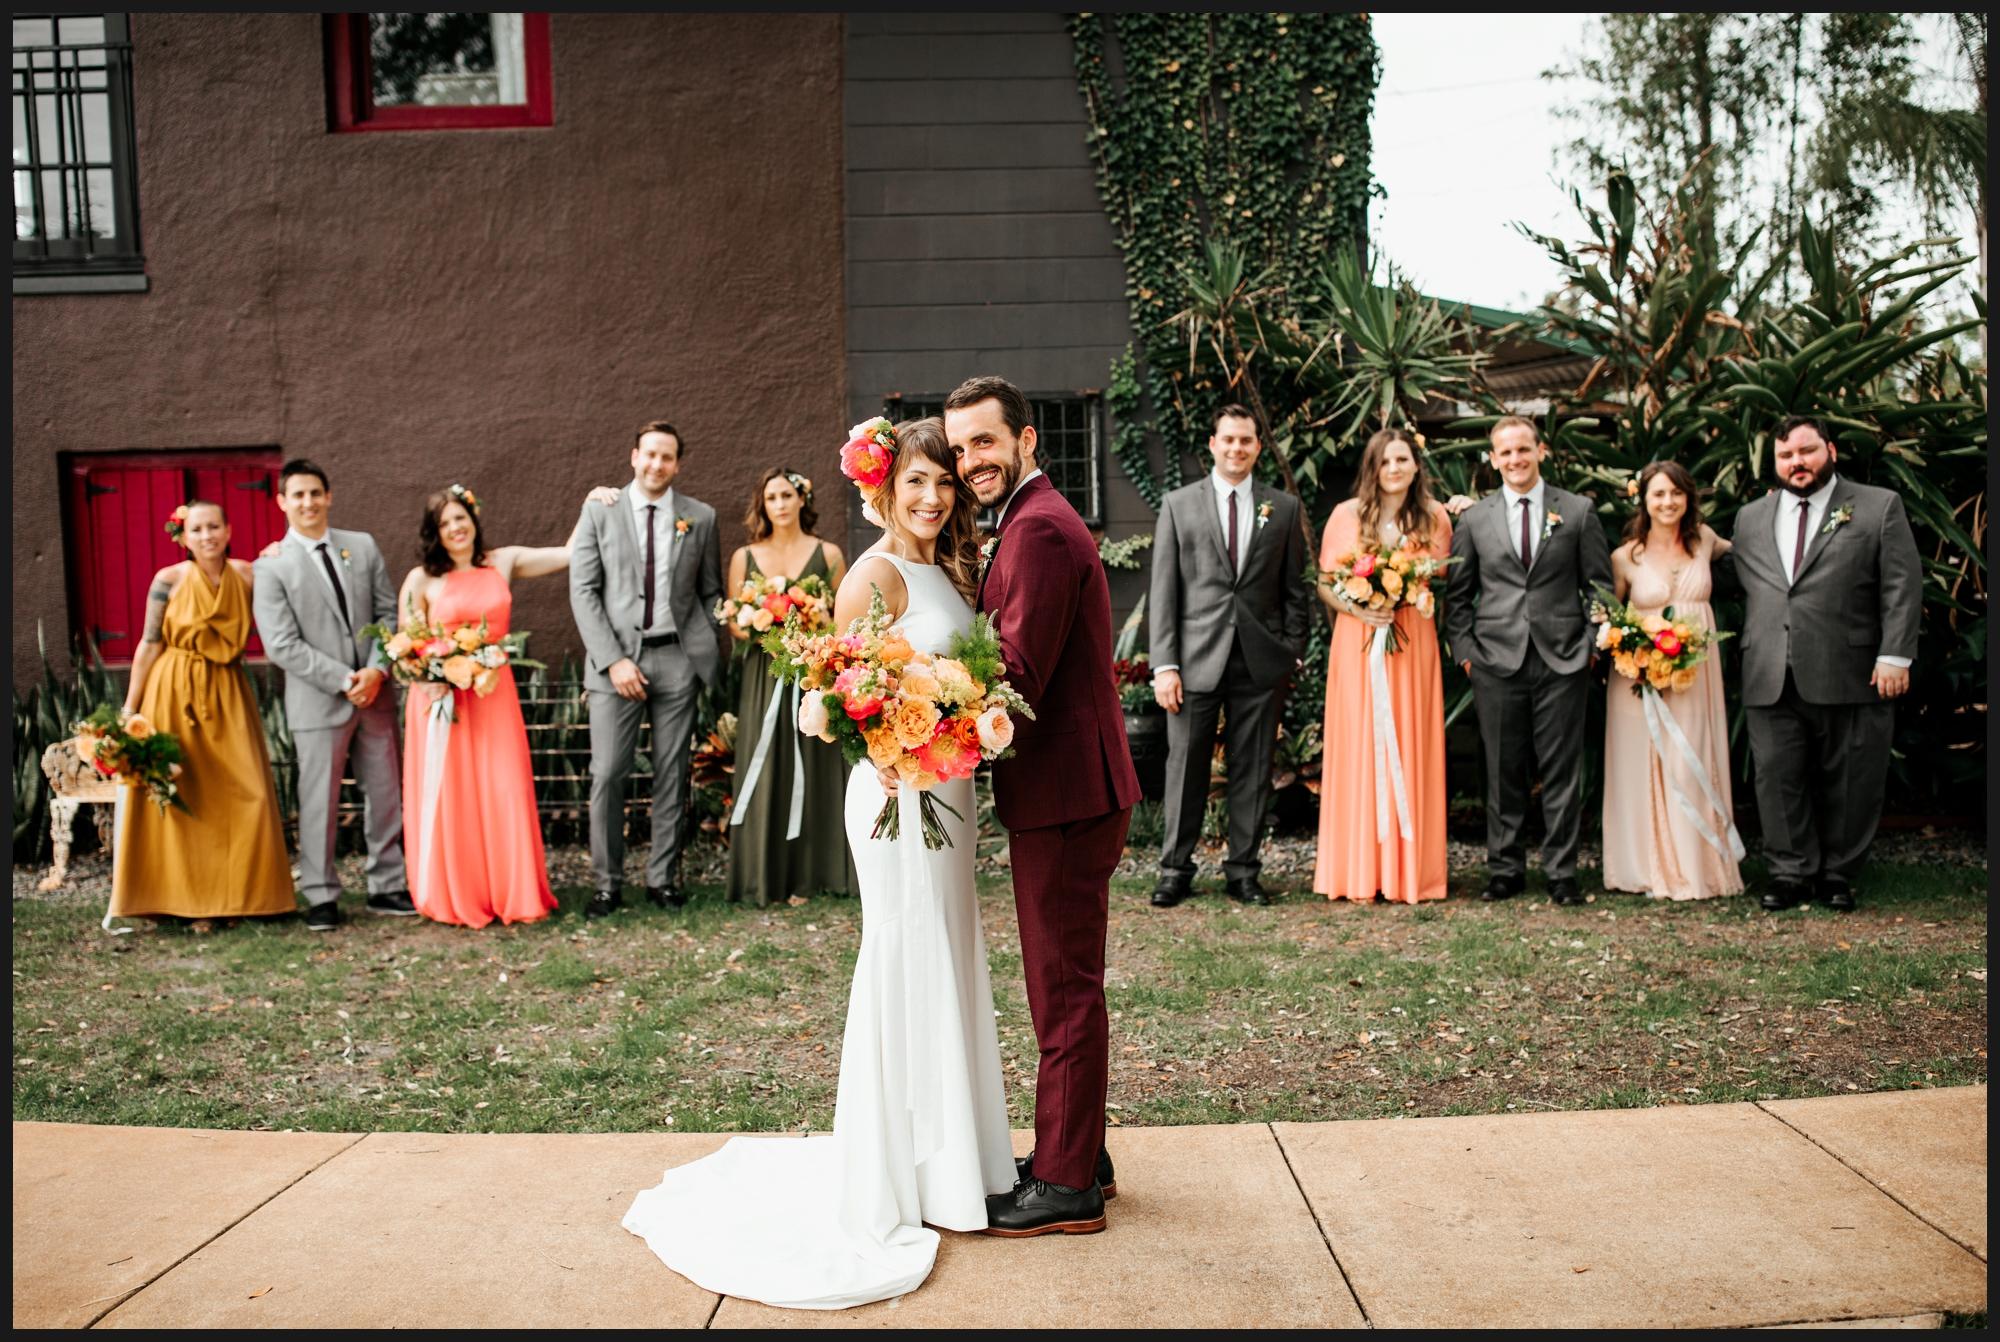 Orlando-Wedding-Photographer-destination-wedding-photographer-florida-wedding-photographer-bohemian-wedding-photographer_1978.jpg